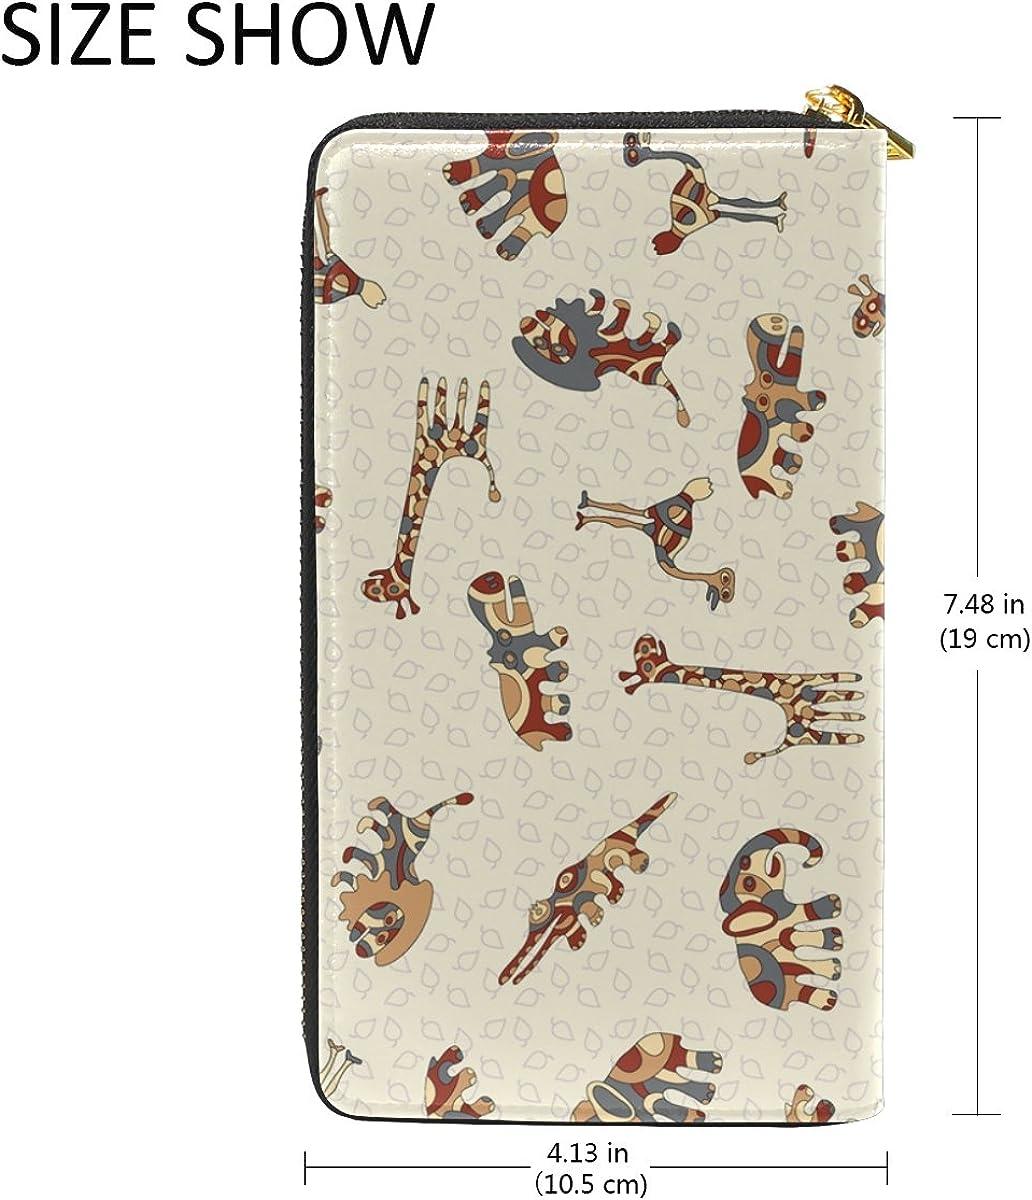 GIOVANIOR Colorful Giraffe Lion Elephant Print Womens Clutch Purses Organizer And Handbags Zip Around Wallet